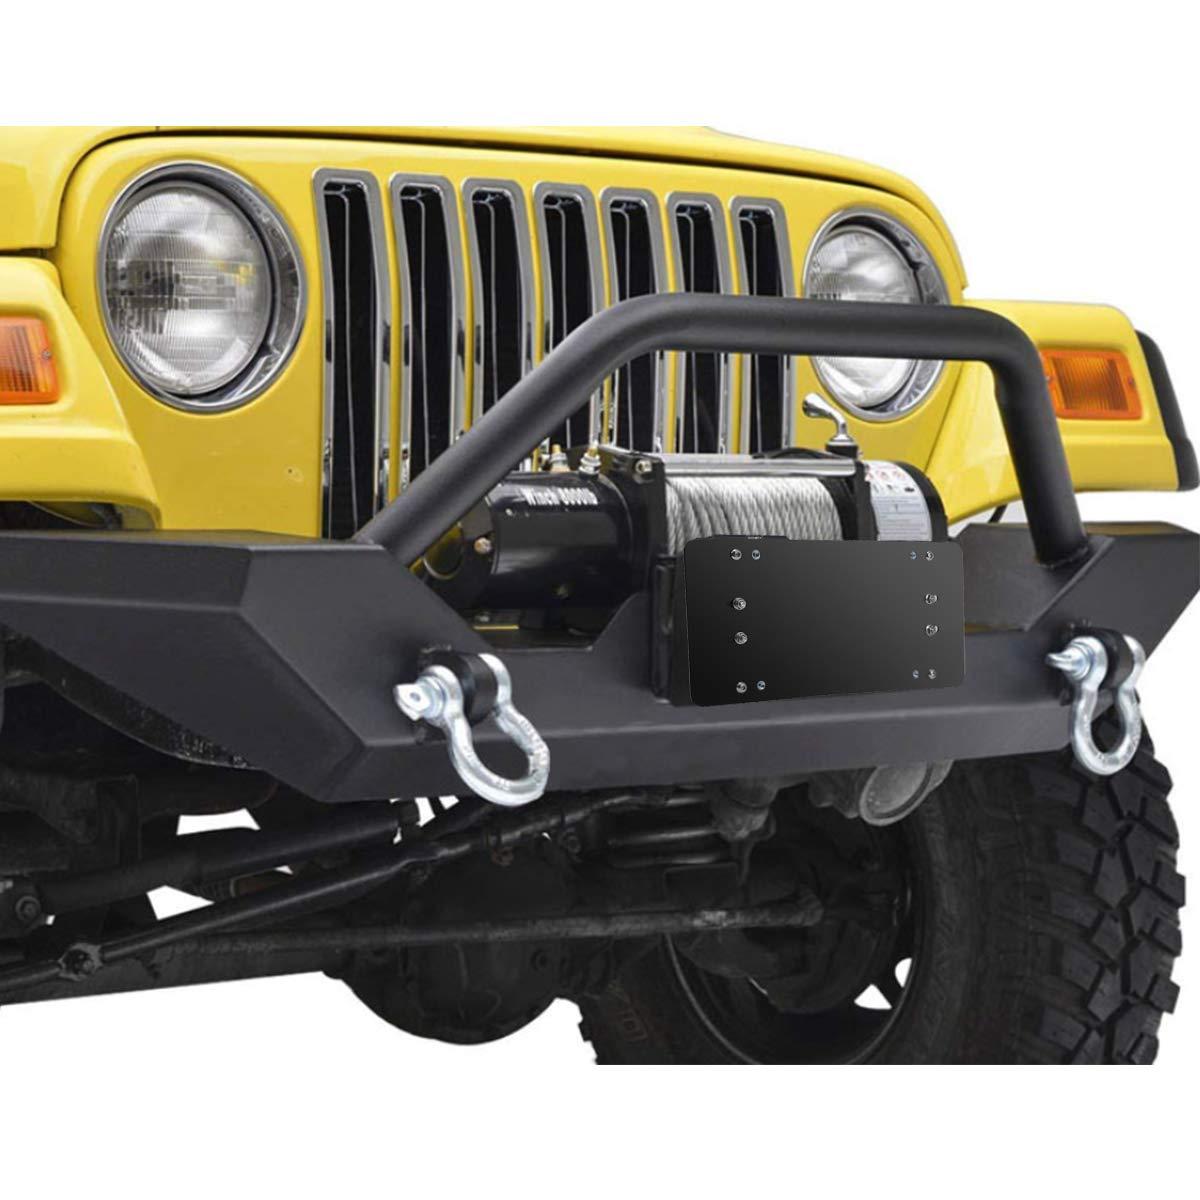 Flip Up License Plate Mount Winch Roller Fairlead Mounting Bracket Holder Black Stainless Steel